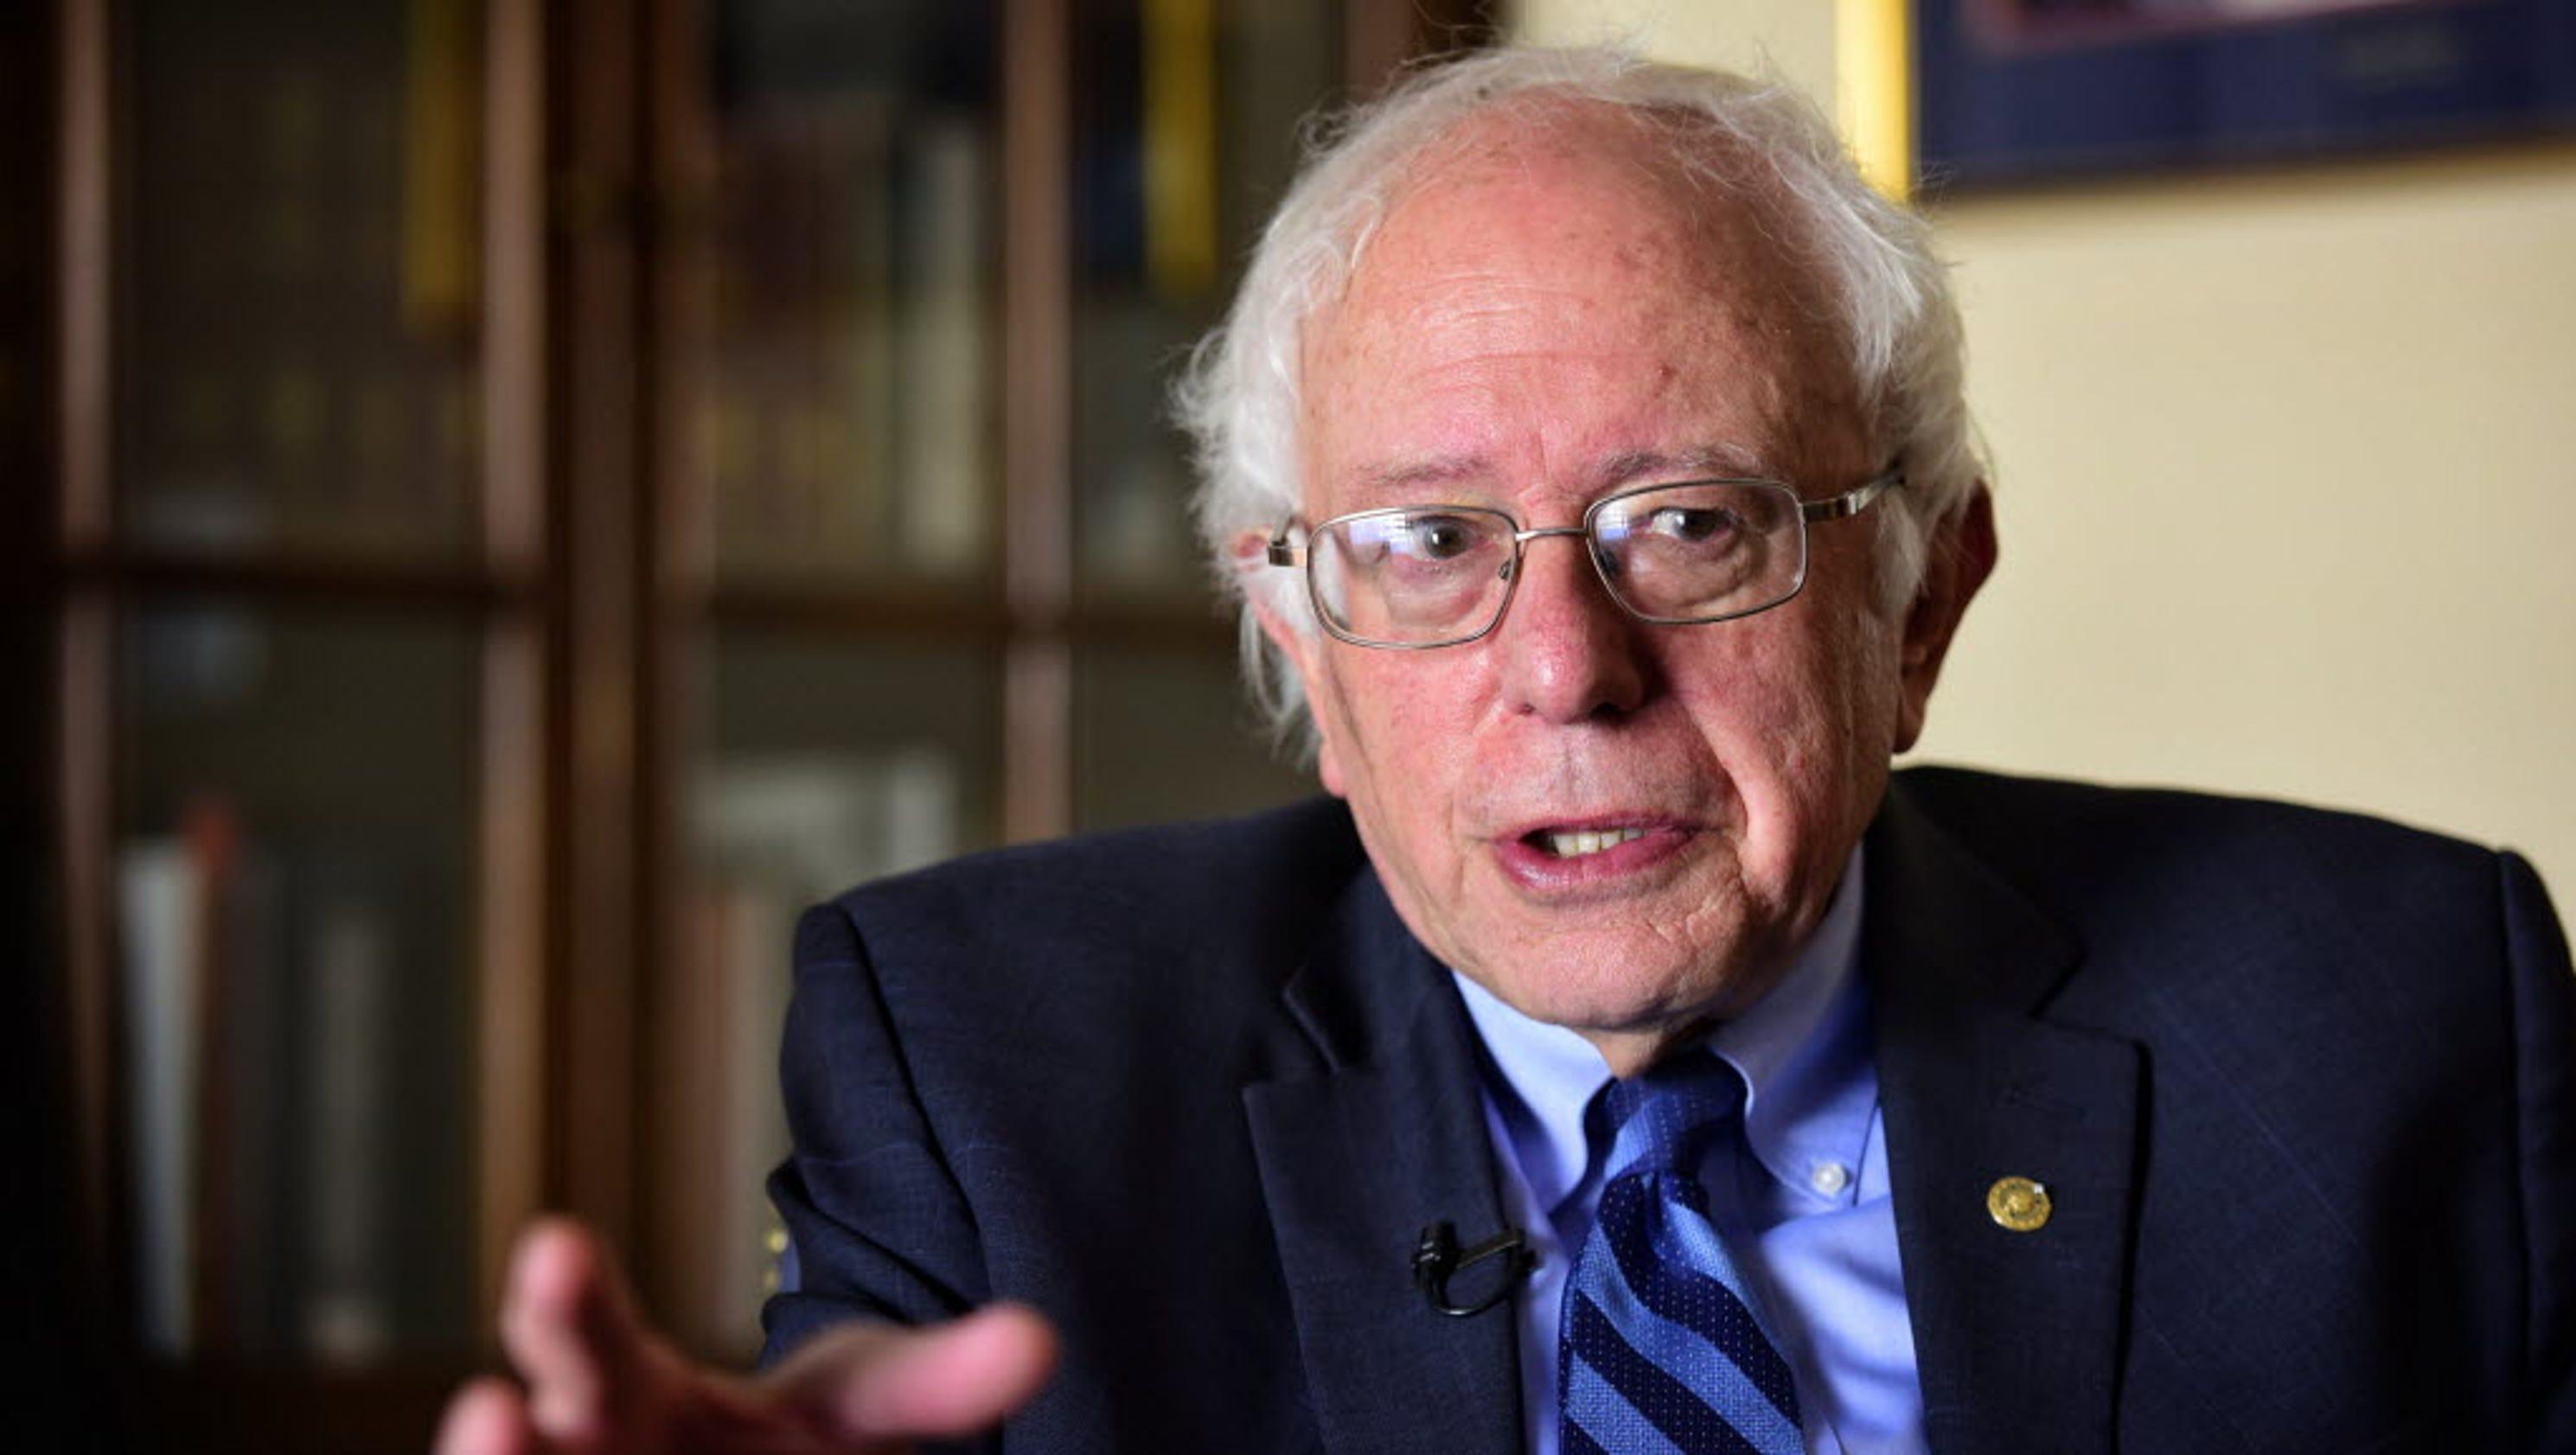 Bernie Sanders will launch organizations to spread ...